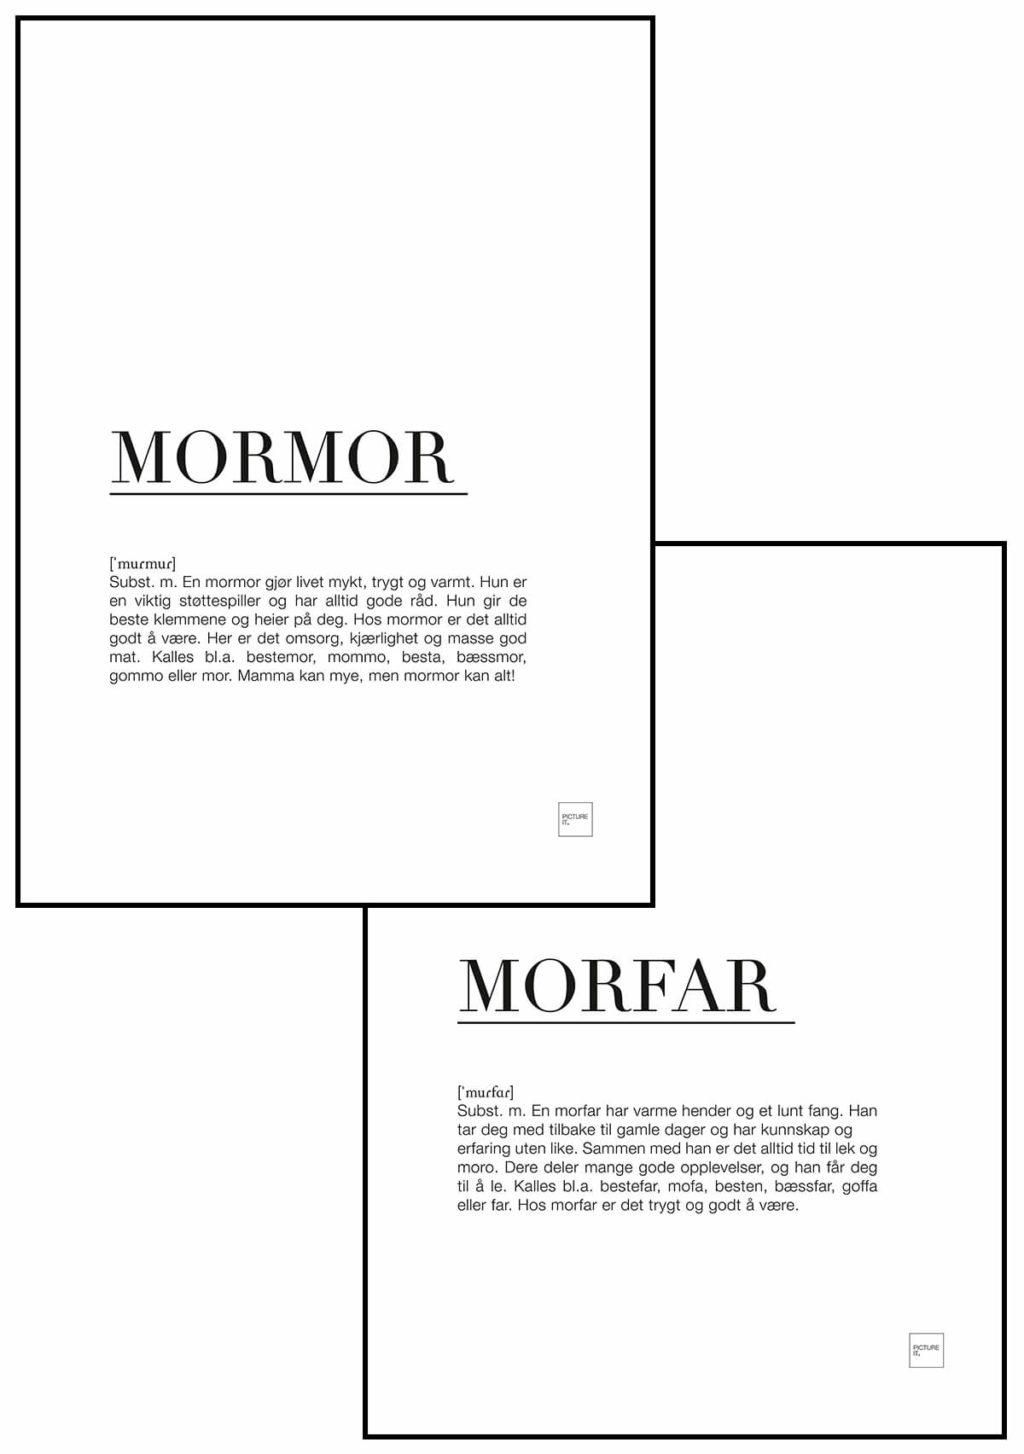 MORMOR + MORFAR GAVE